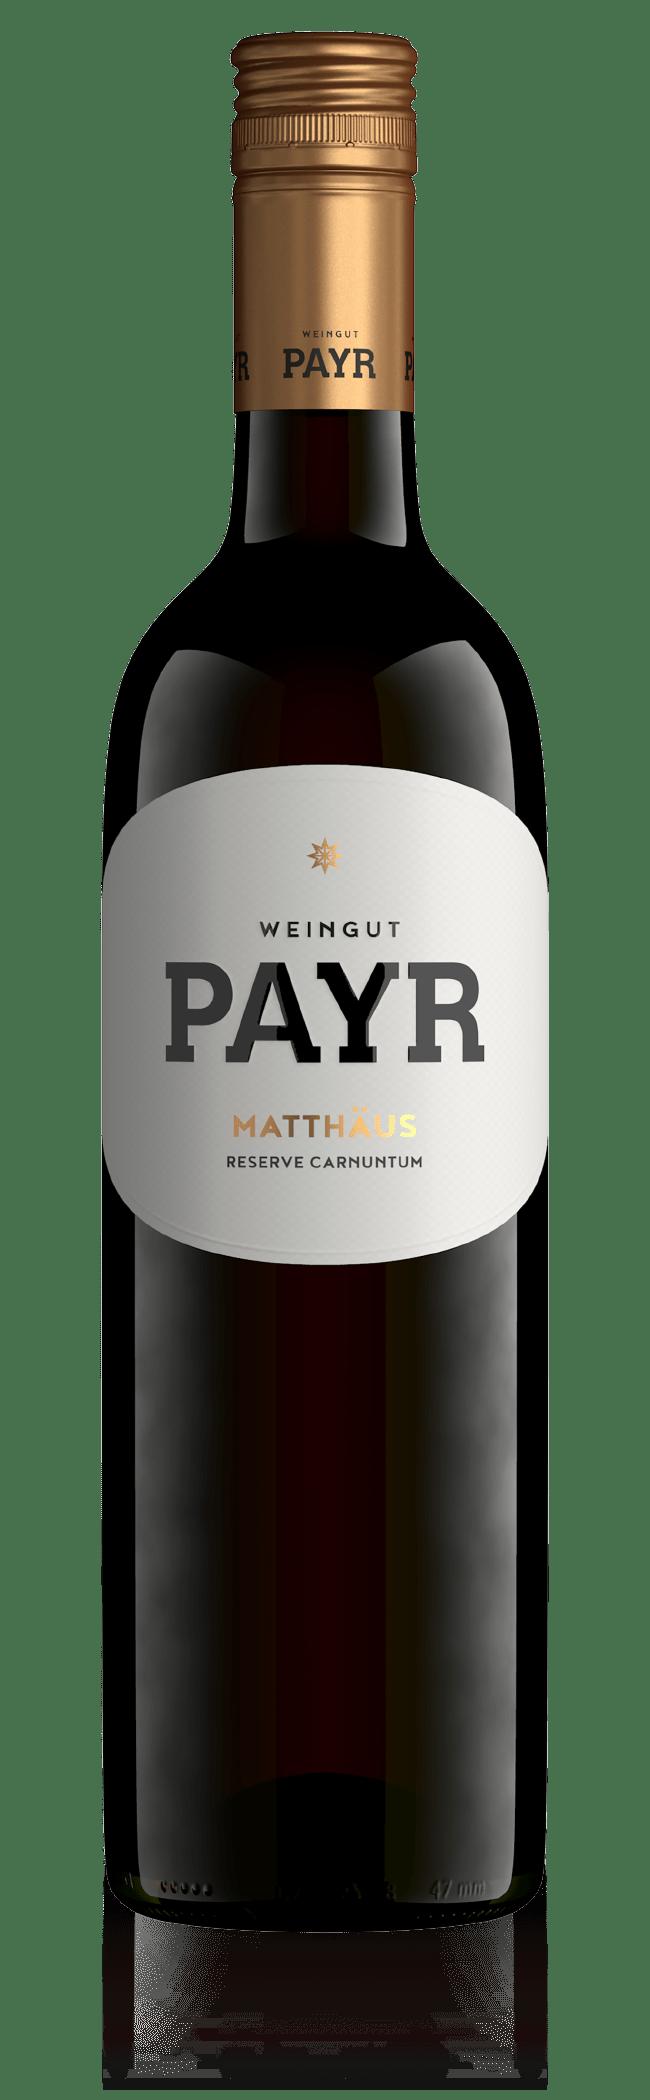 Weingut Payr Matthaeus